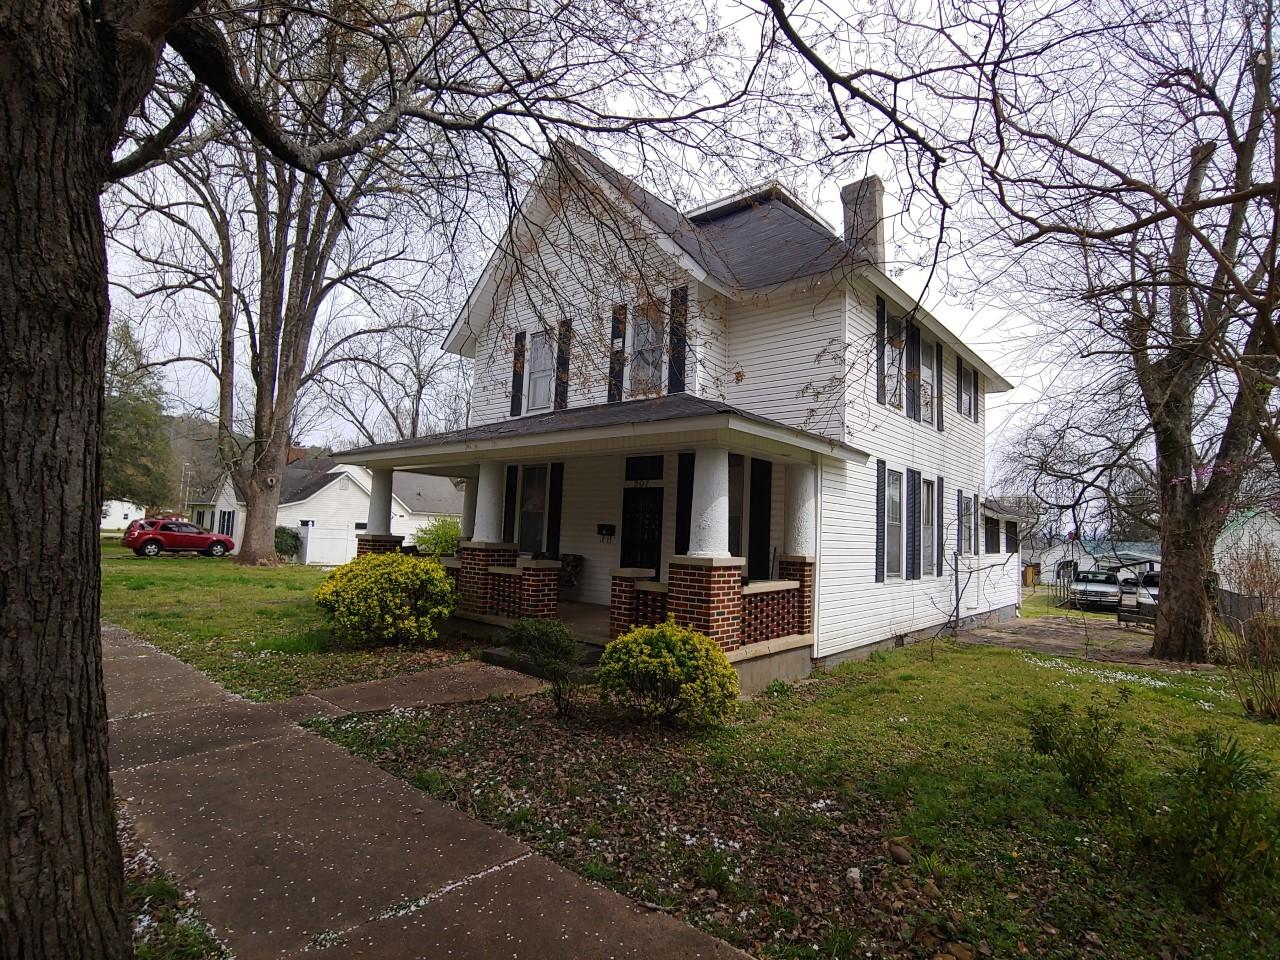 207 Magnolia Ave, South Pittsburg, TN 37380